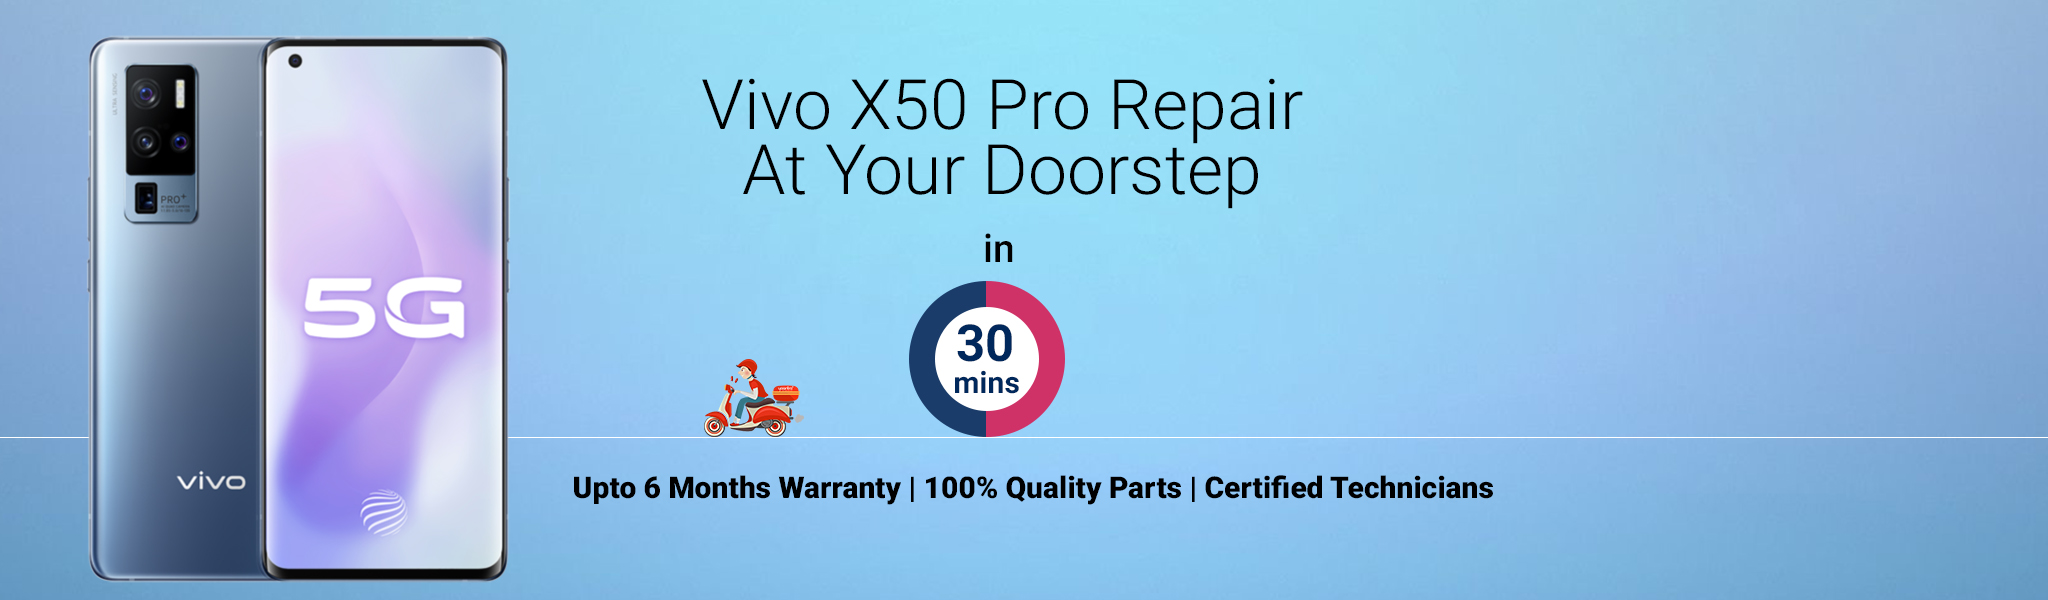 vivo-x50-pro-repair.jpg